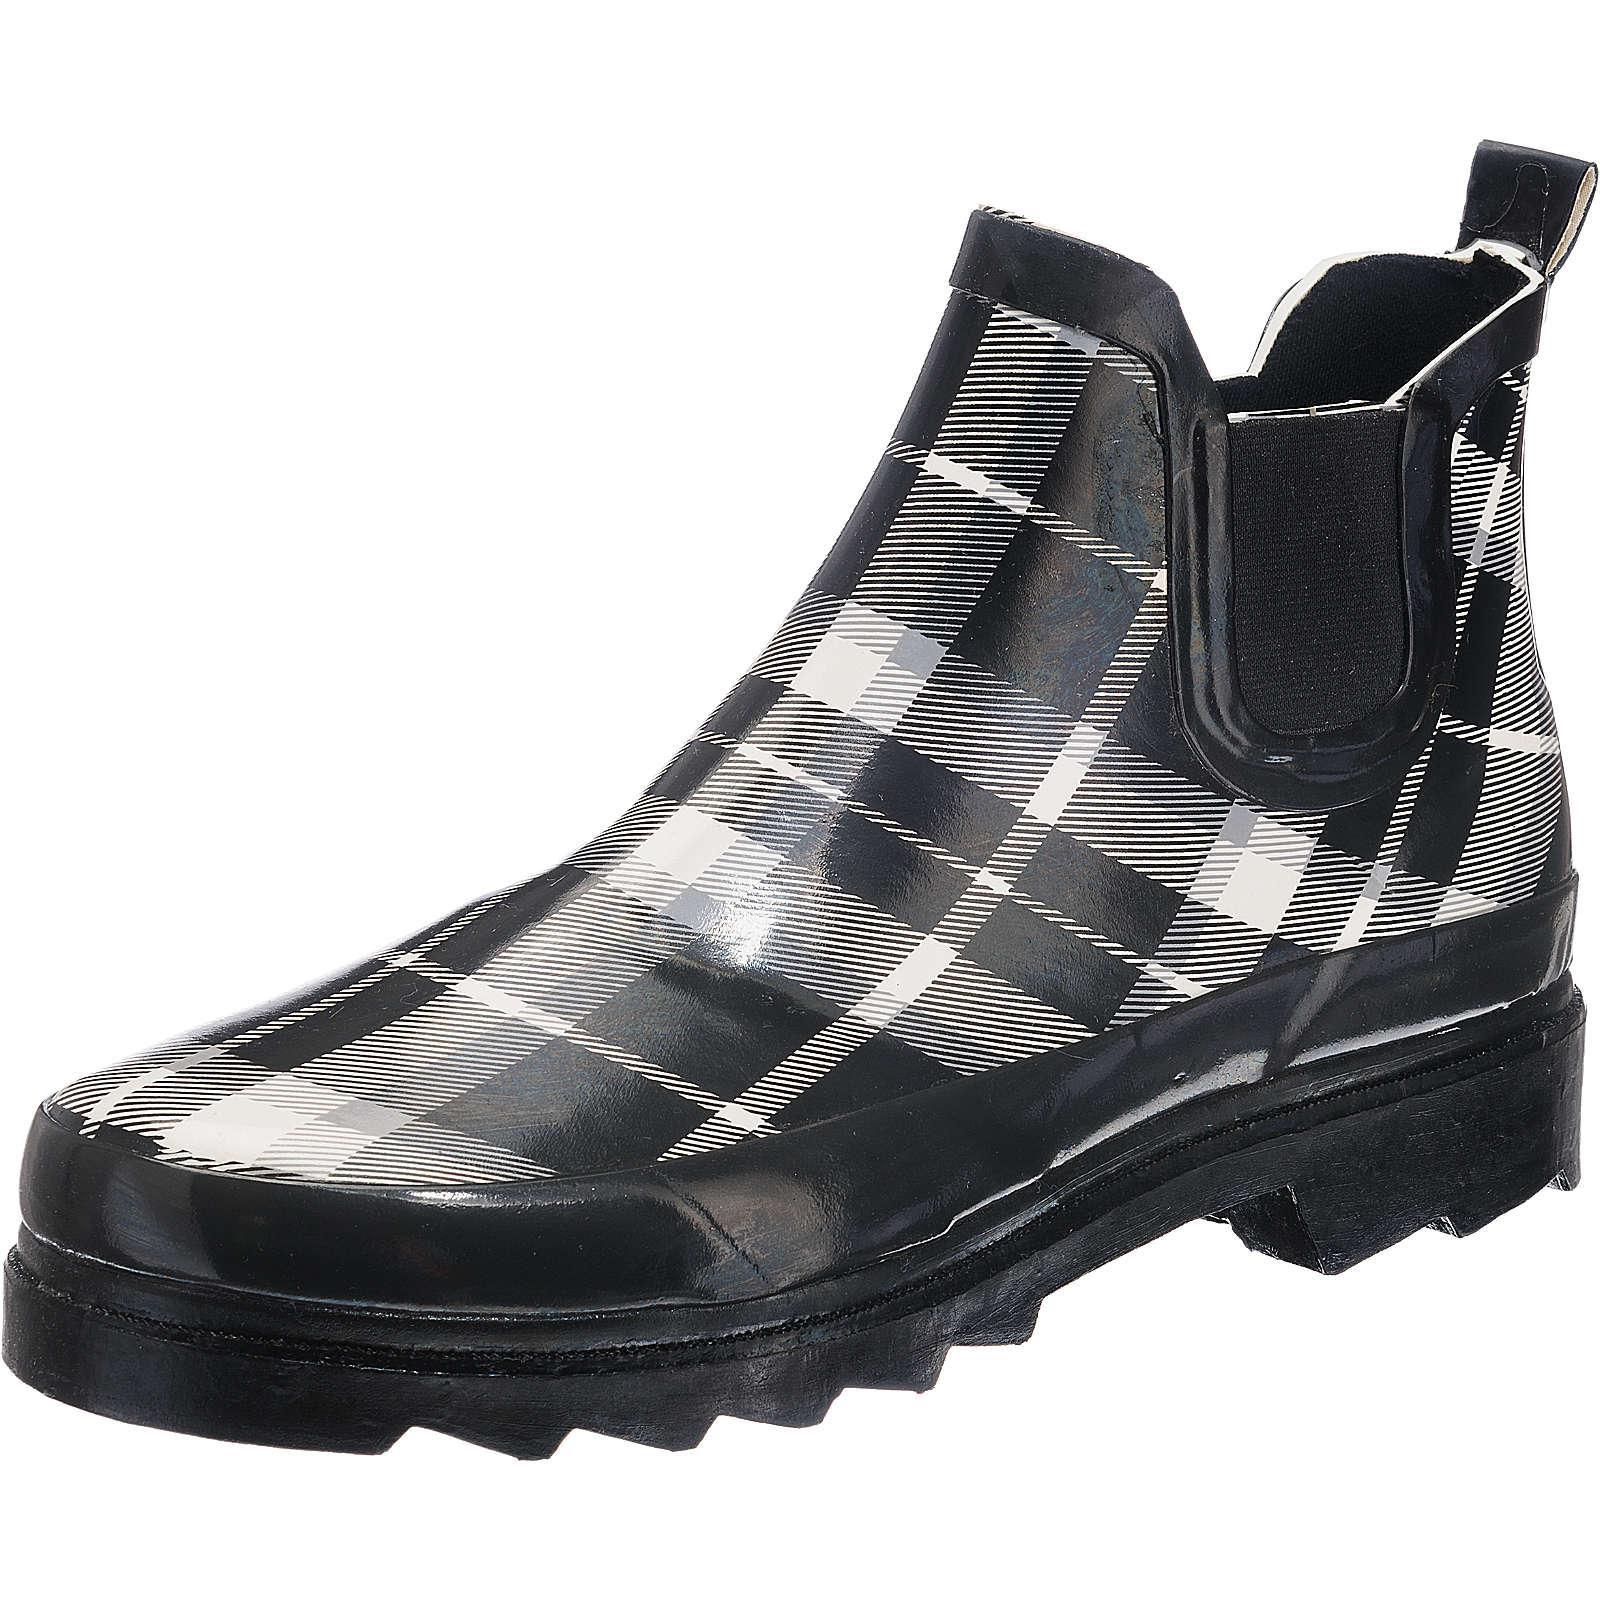 8505c386341965 Rabatt-Preisvergleich.de - Schuhe   Taschen   Damenschuhe   Stiefel ...